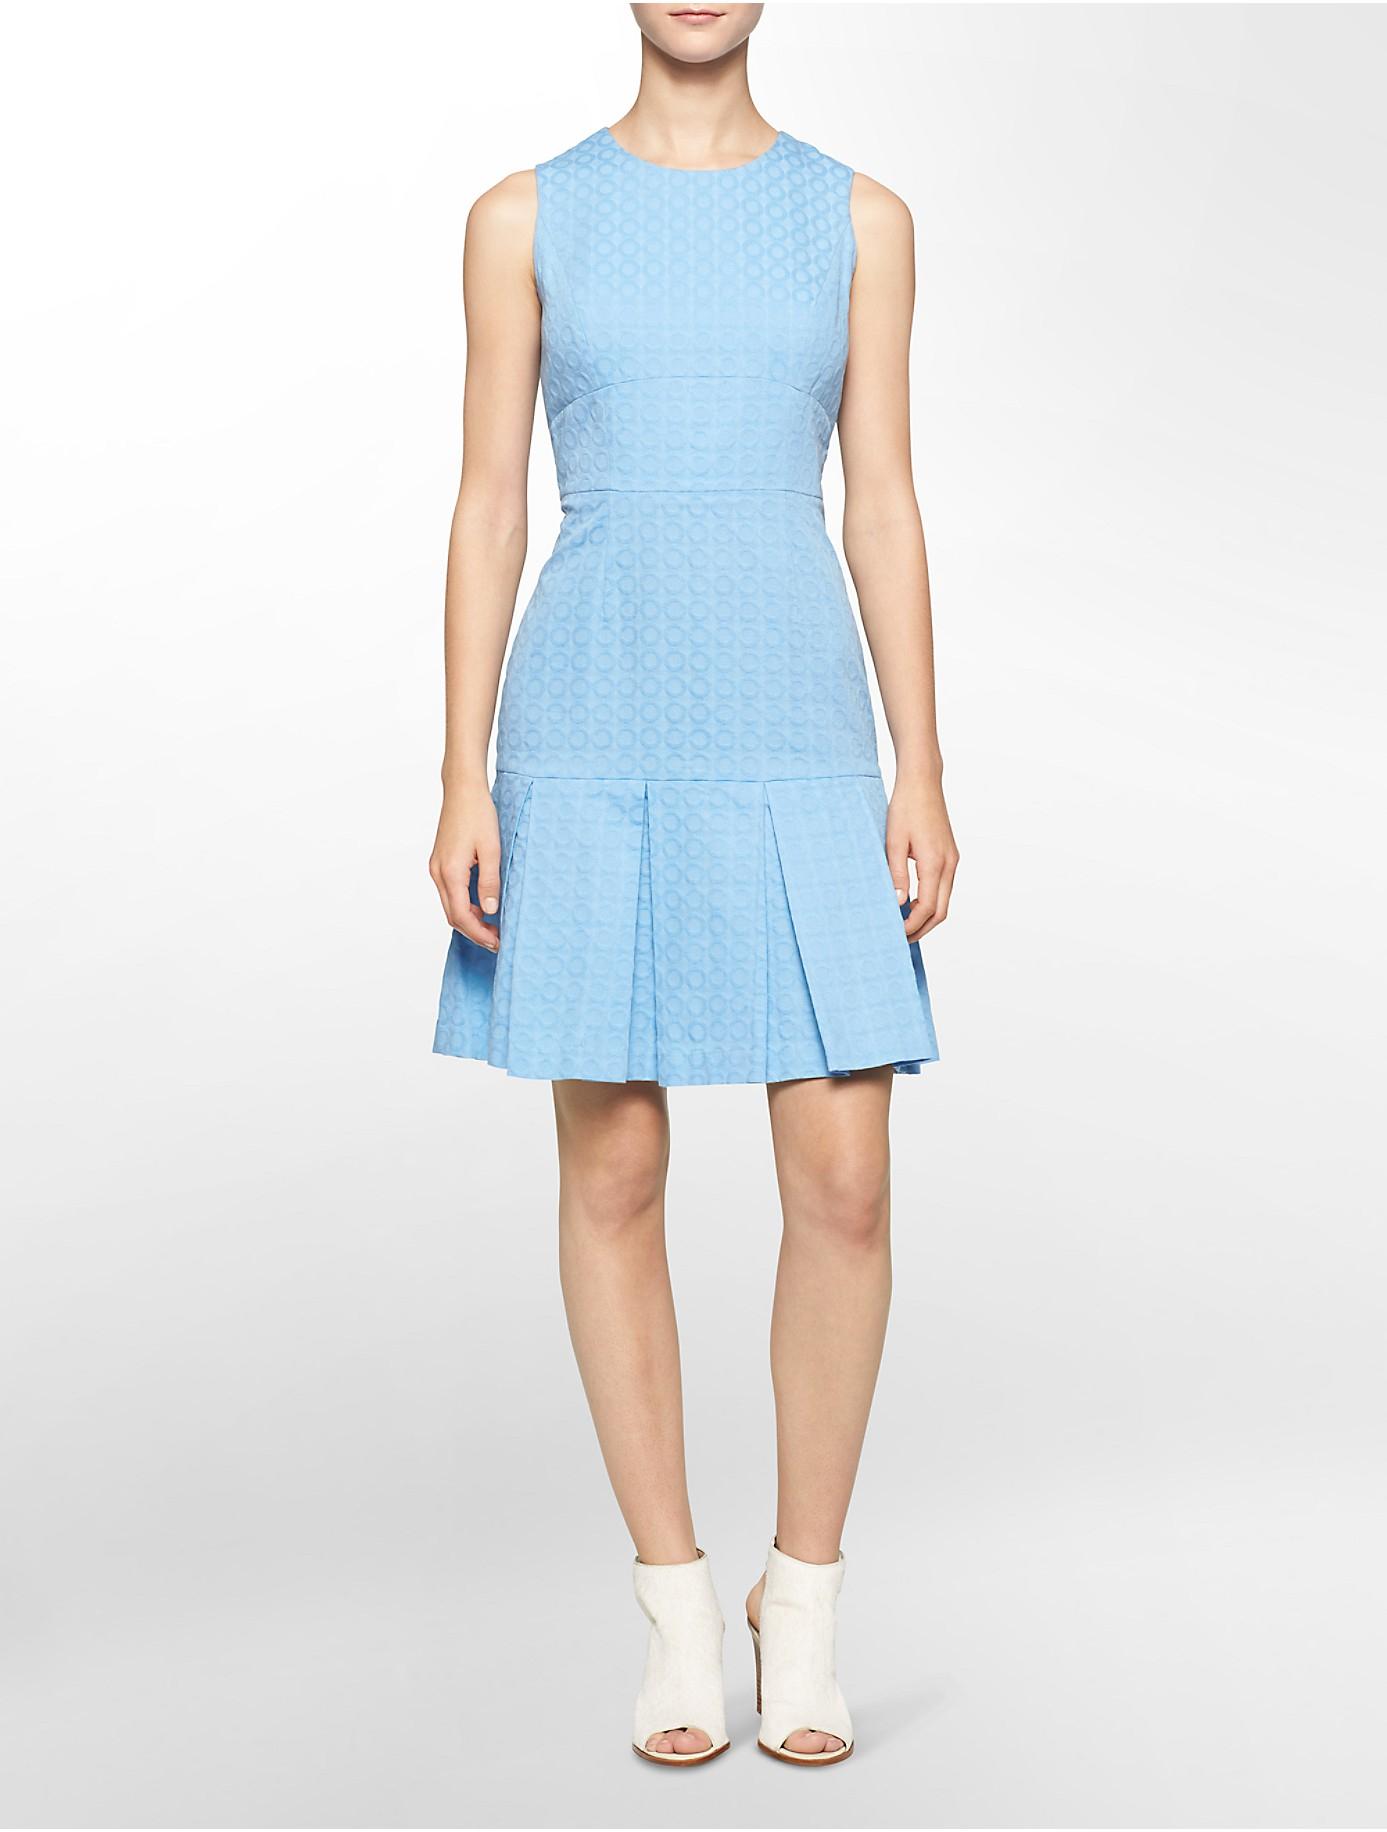 Calvin Klein White Label Textured Pleated Sleeveless Fit